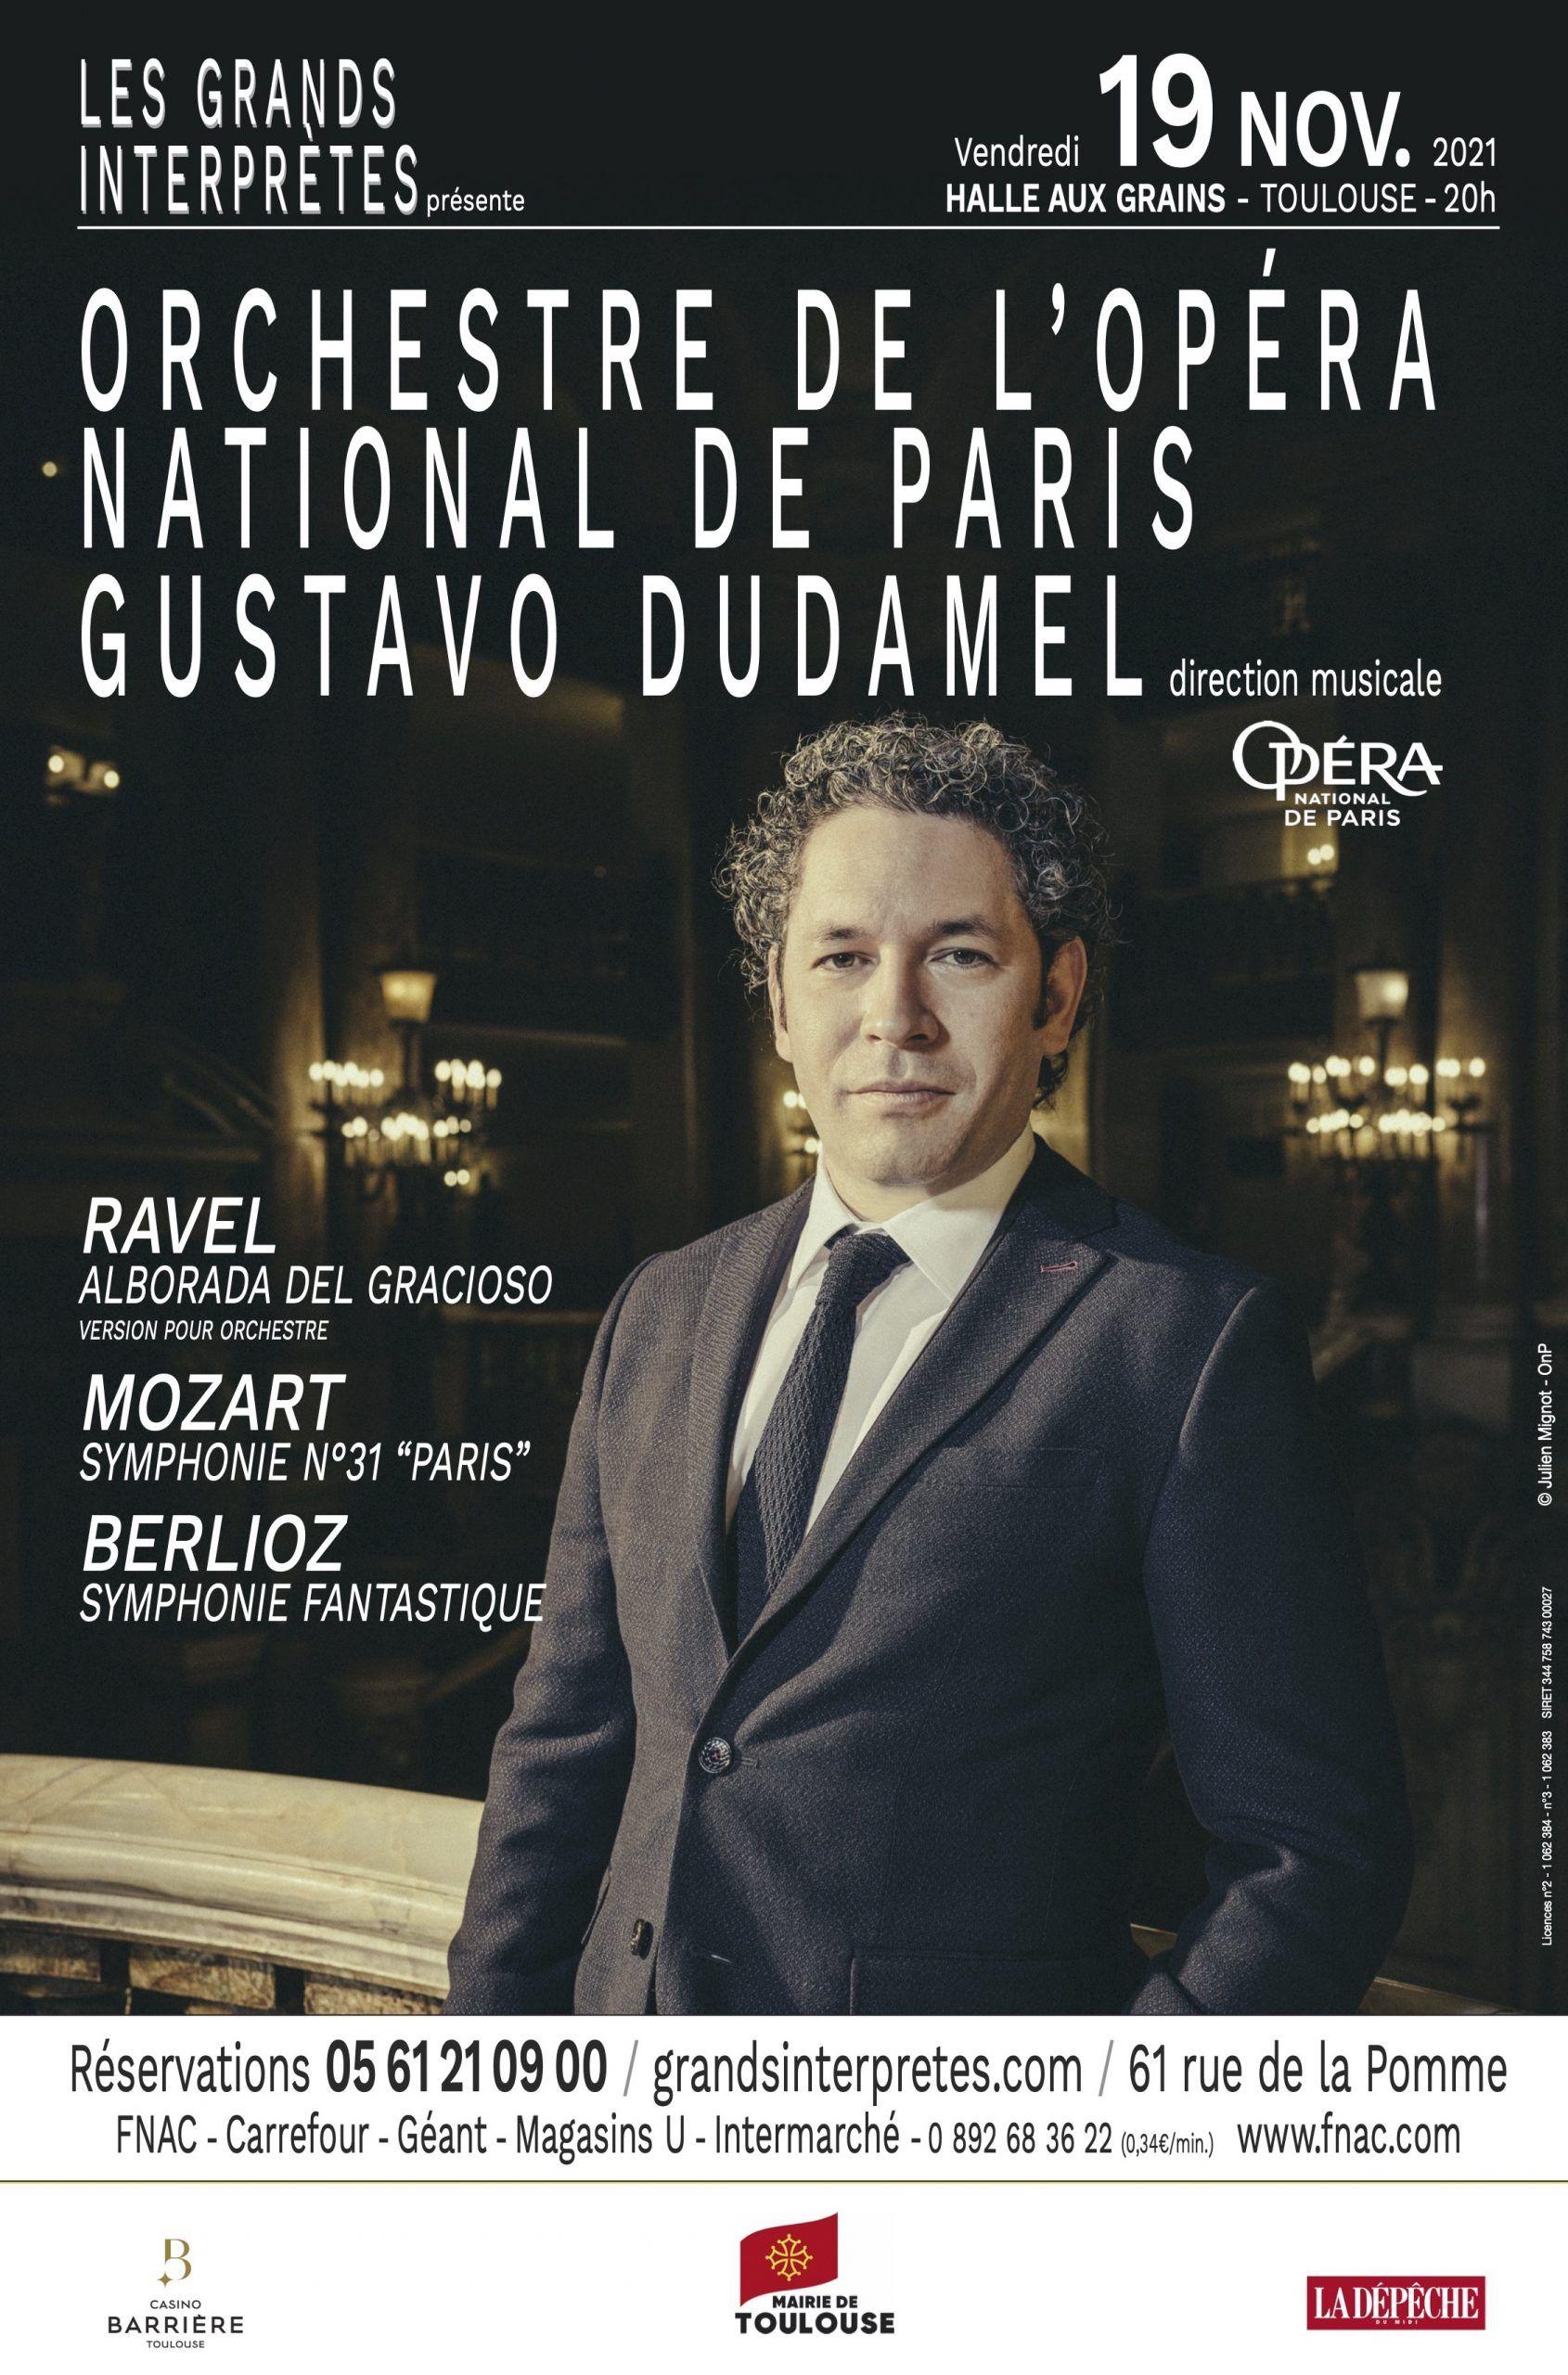 Les Grands Interprètes - Gustavo Dudamel